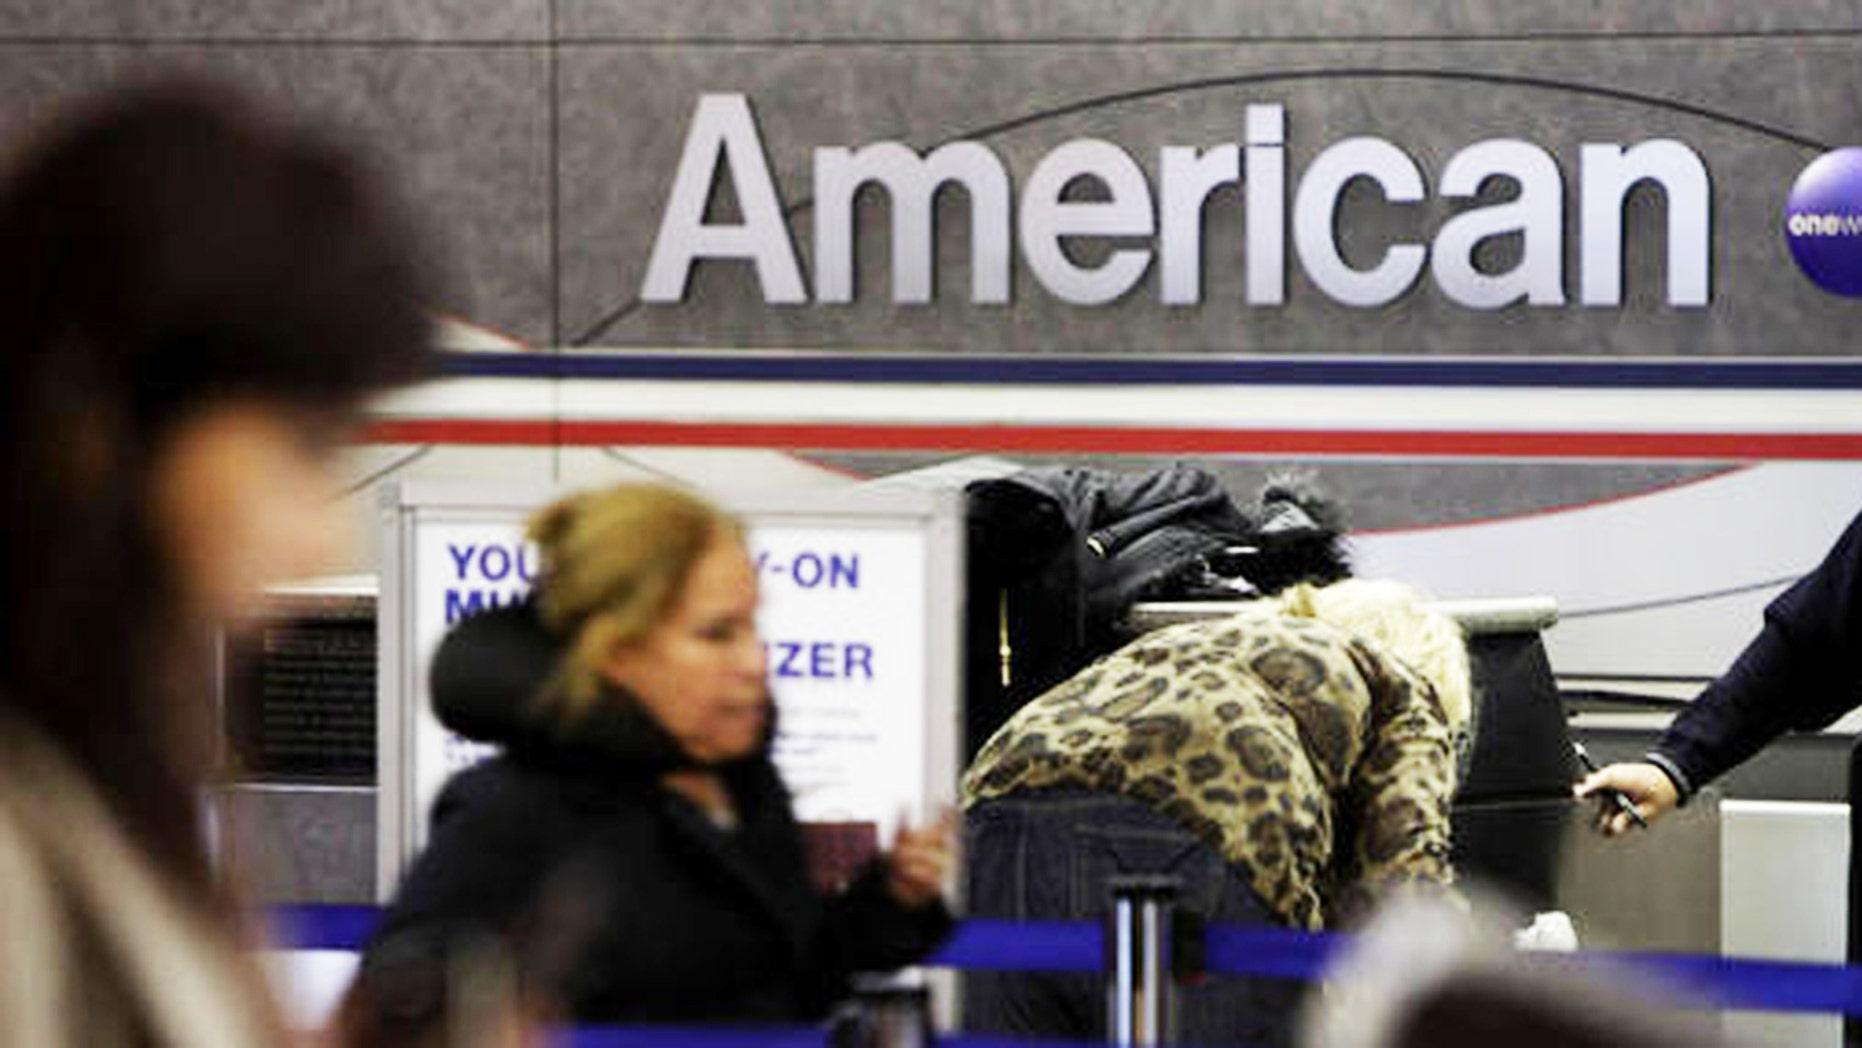 A passenger's meltdown was captured after a 12-hour furloughed flight.